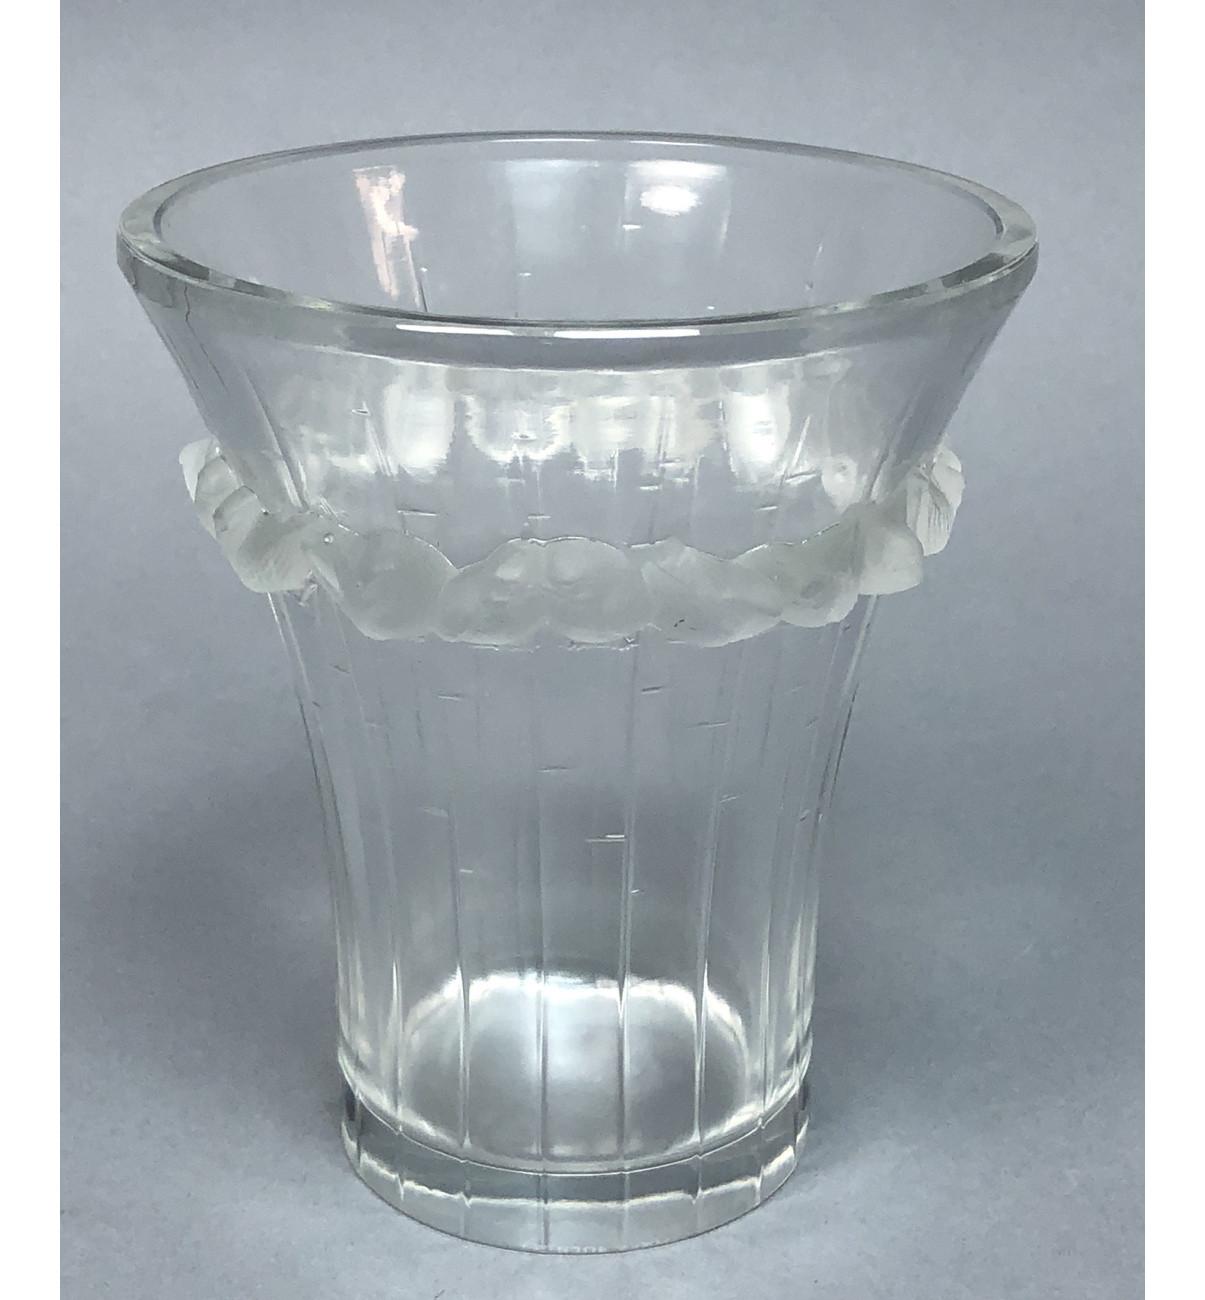 vintage lalique crystal vases of ml 210 vintage lalique france crystal vase raised frosted crystal throughout 210 vintage lalique france crystal vase